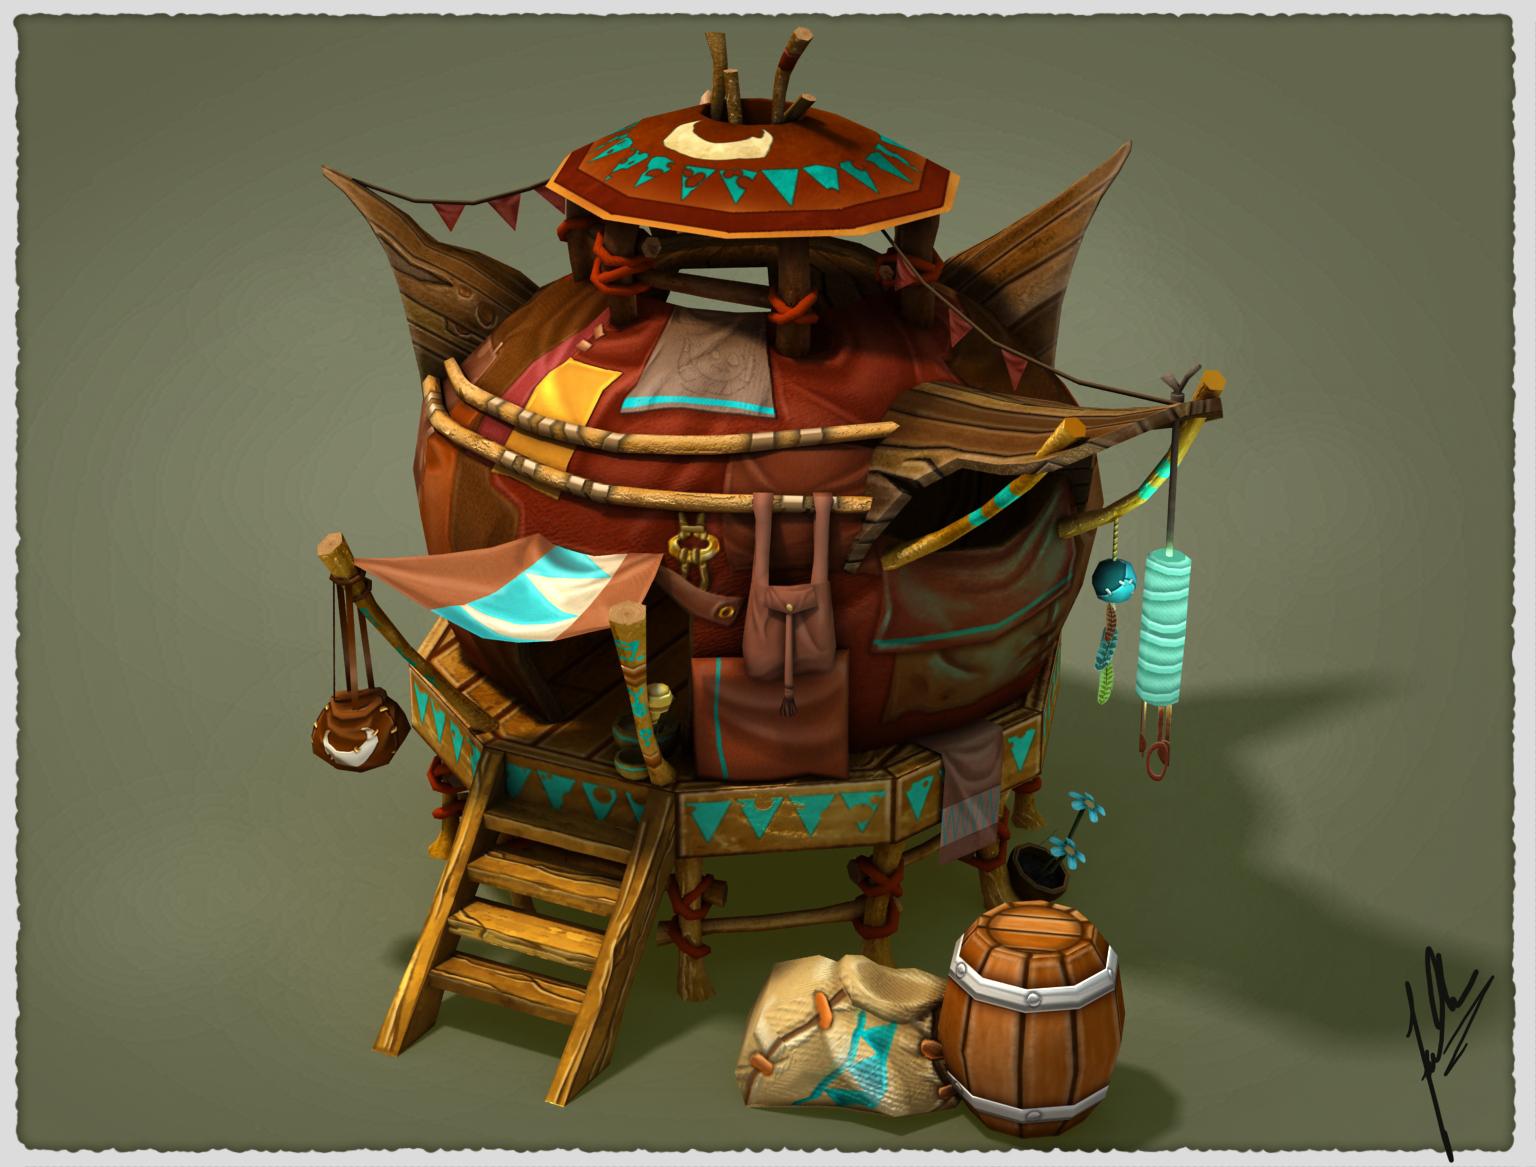 Fantasy House Yurt By Fallonclarke On Deviantart